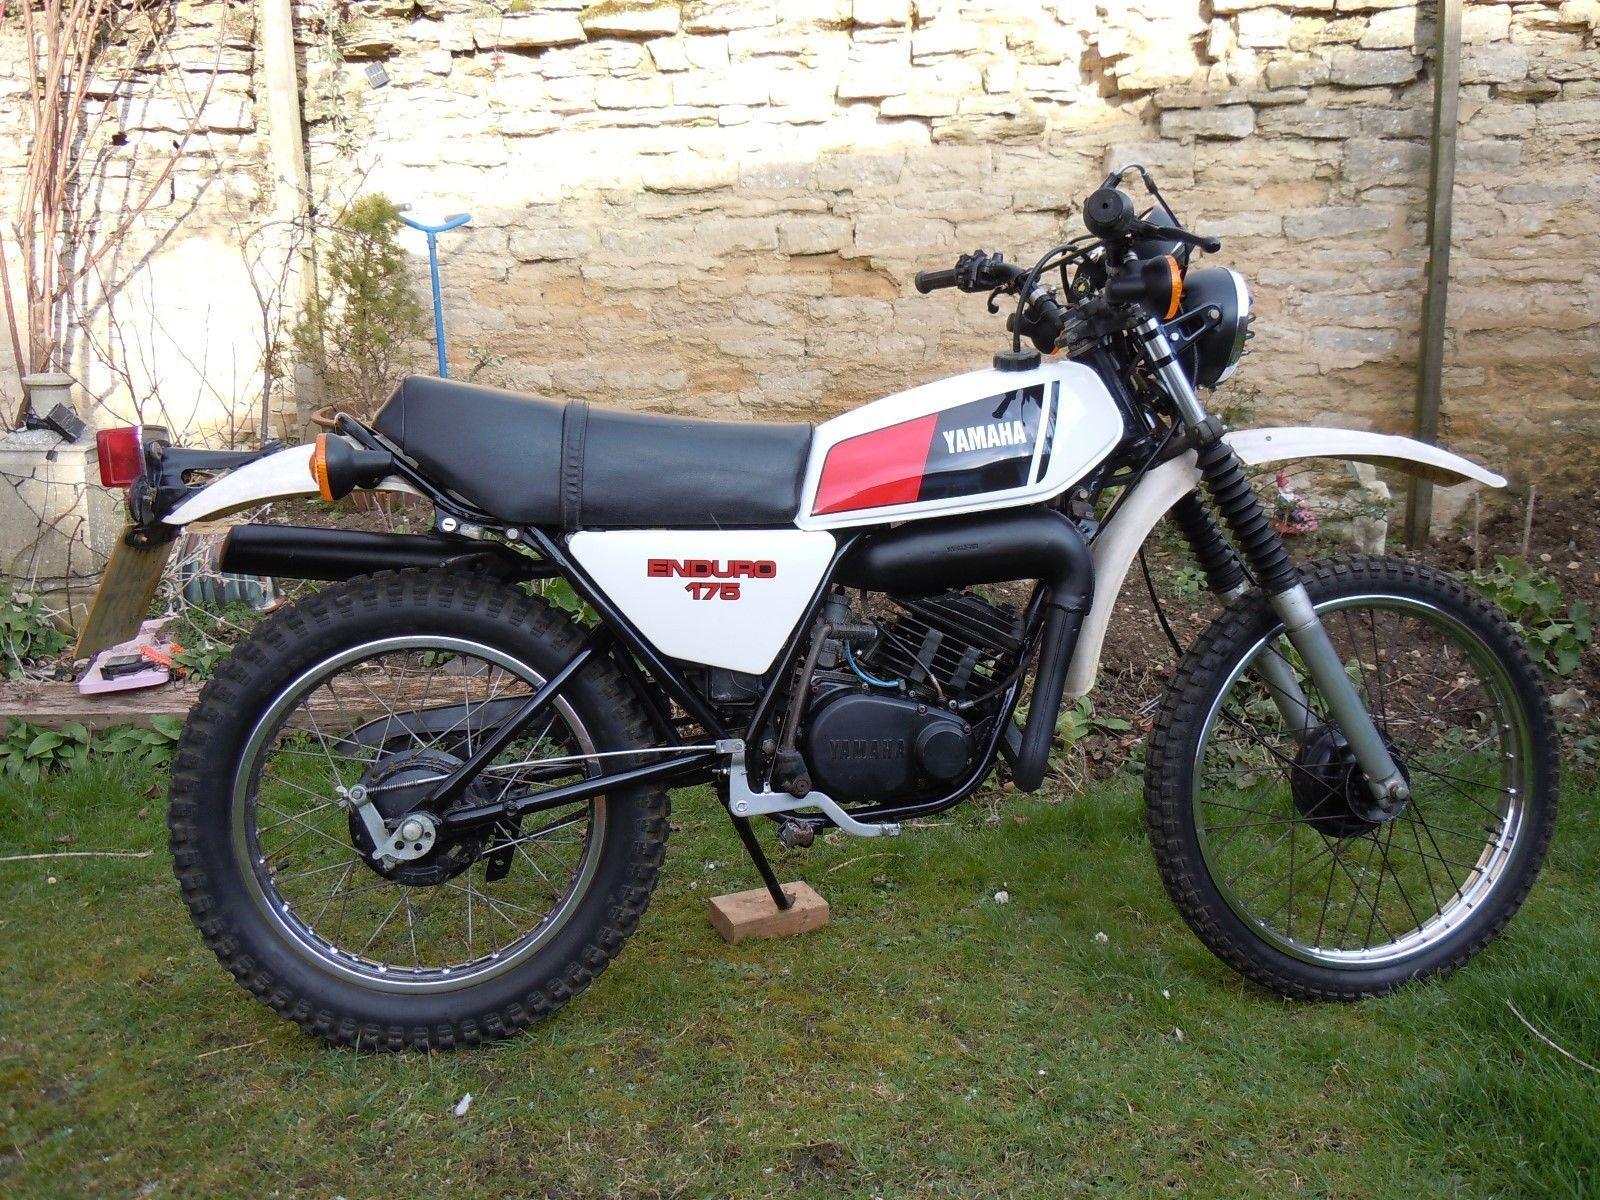 Diagram Of 1980 Xs850g Yamaha Motorcycle Carburetor Diagram And Parts